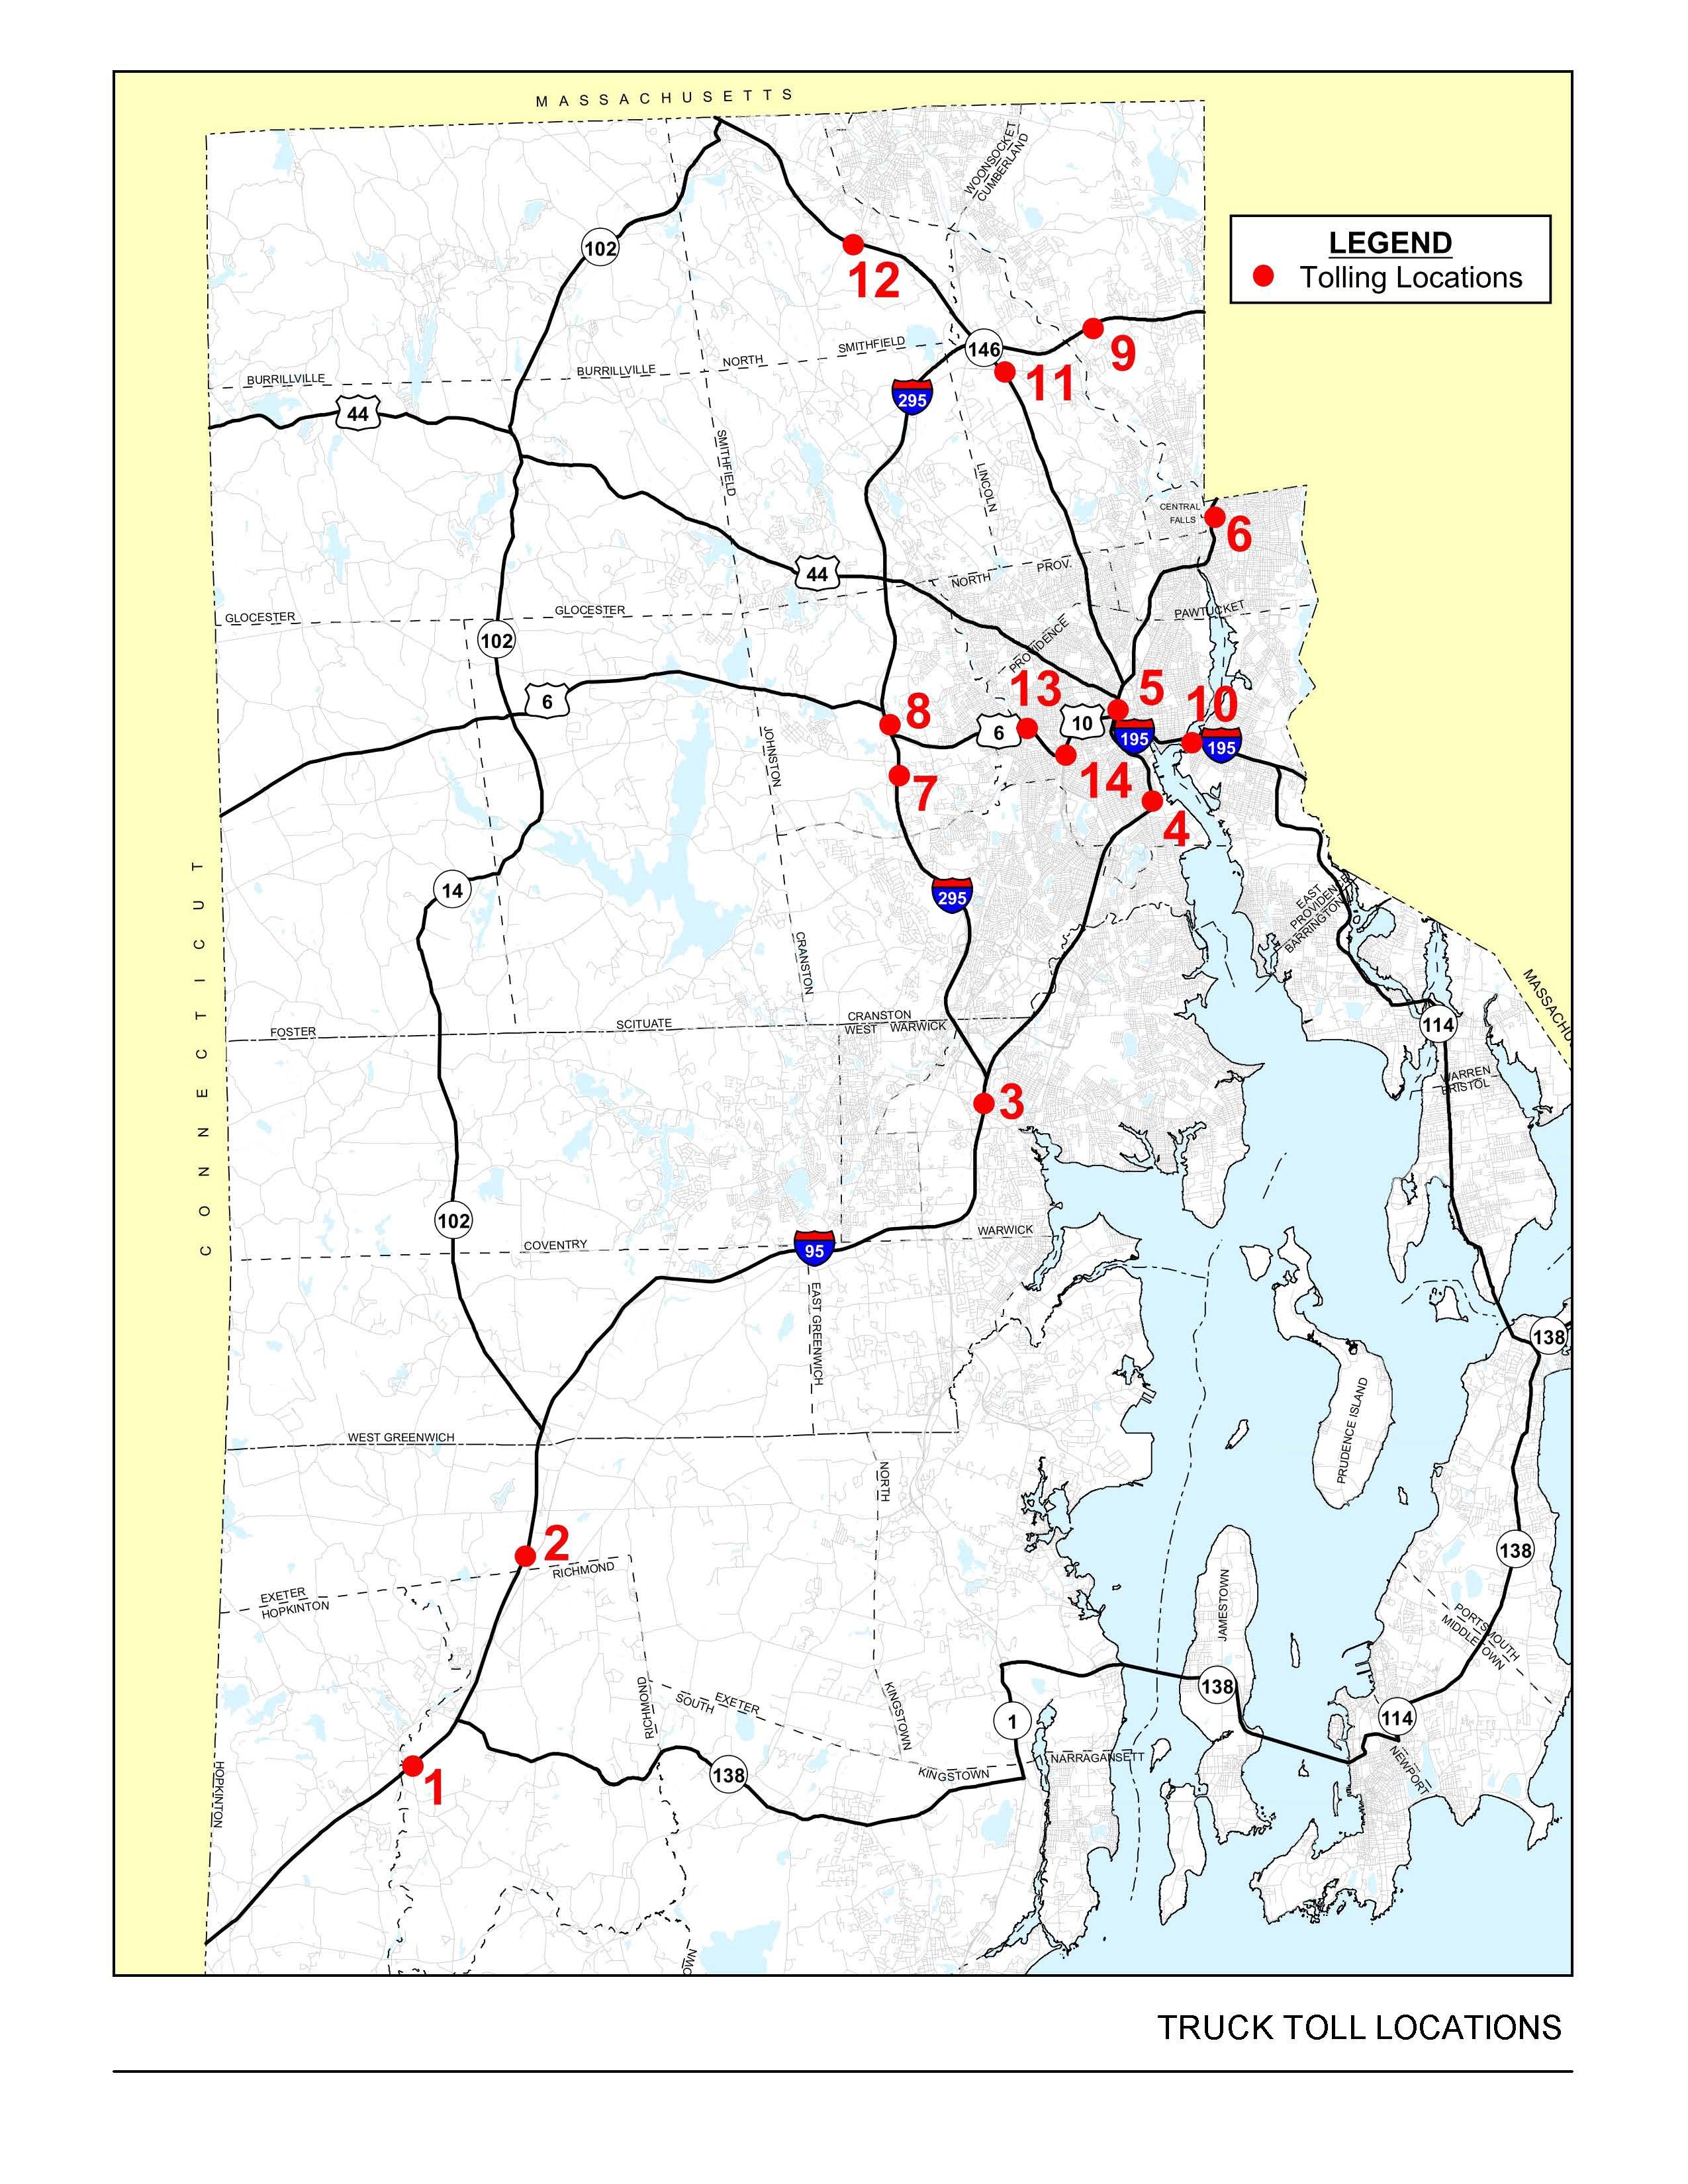 Truck tolls location map